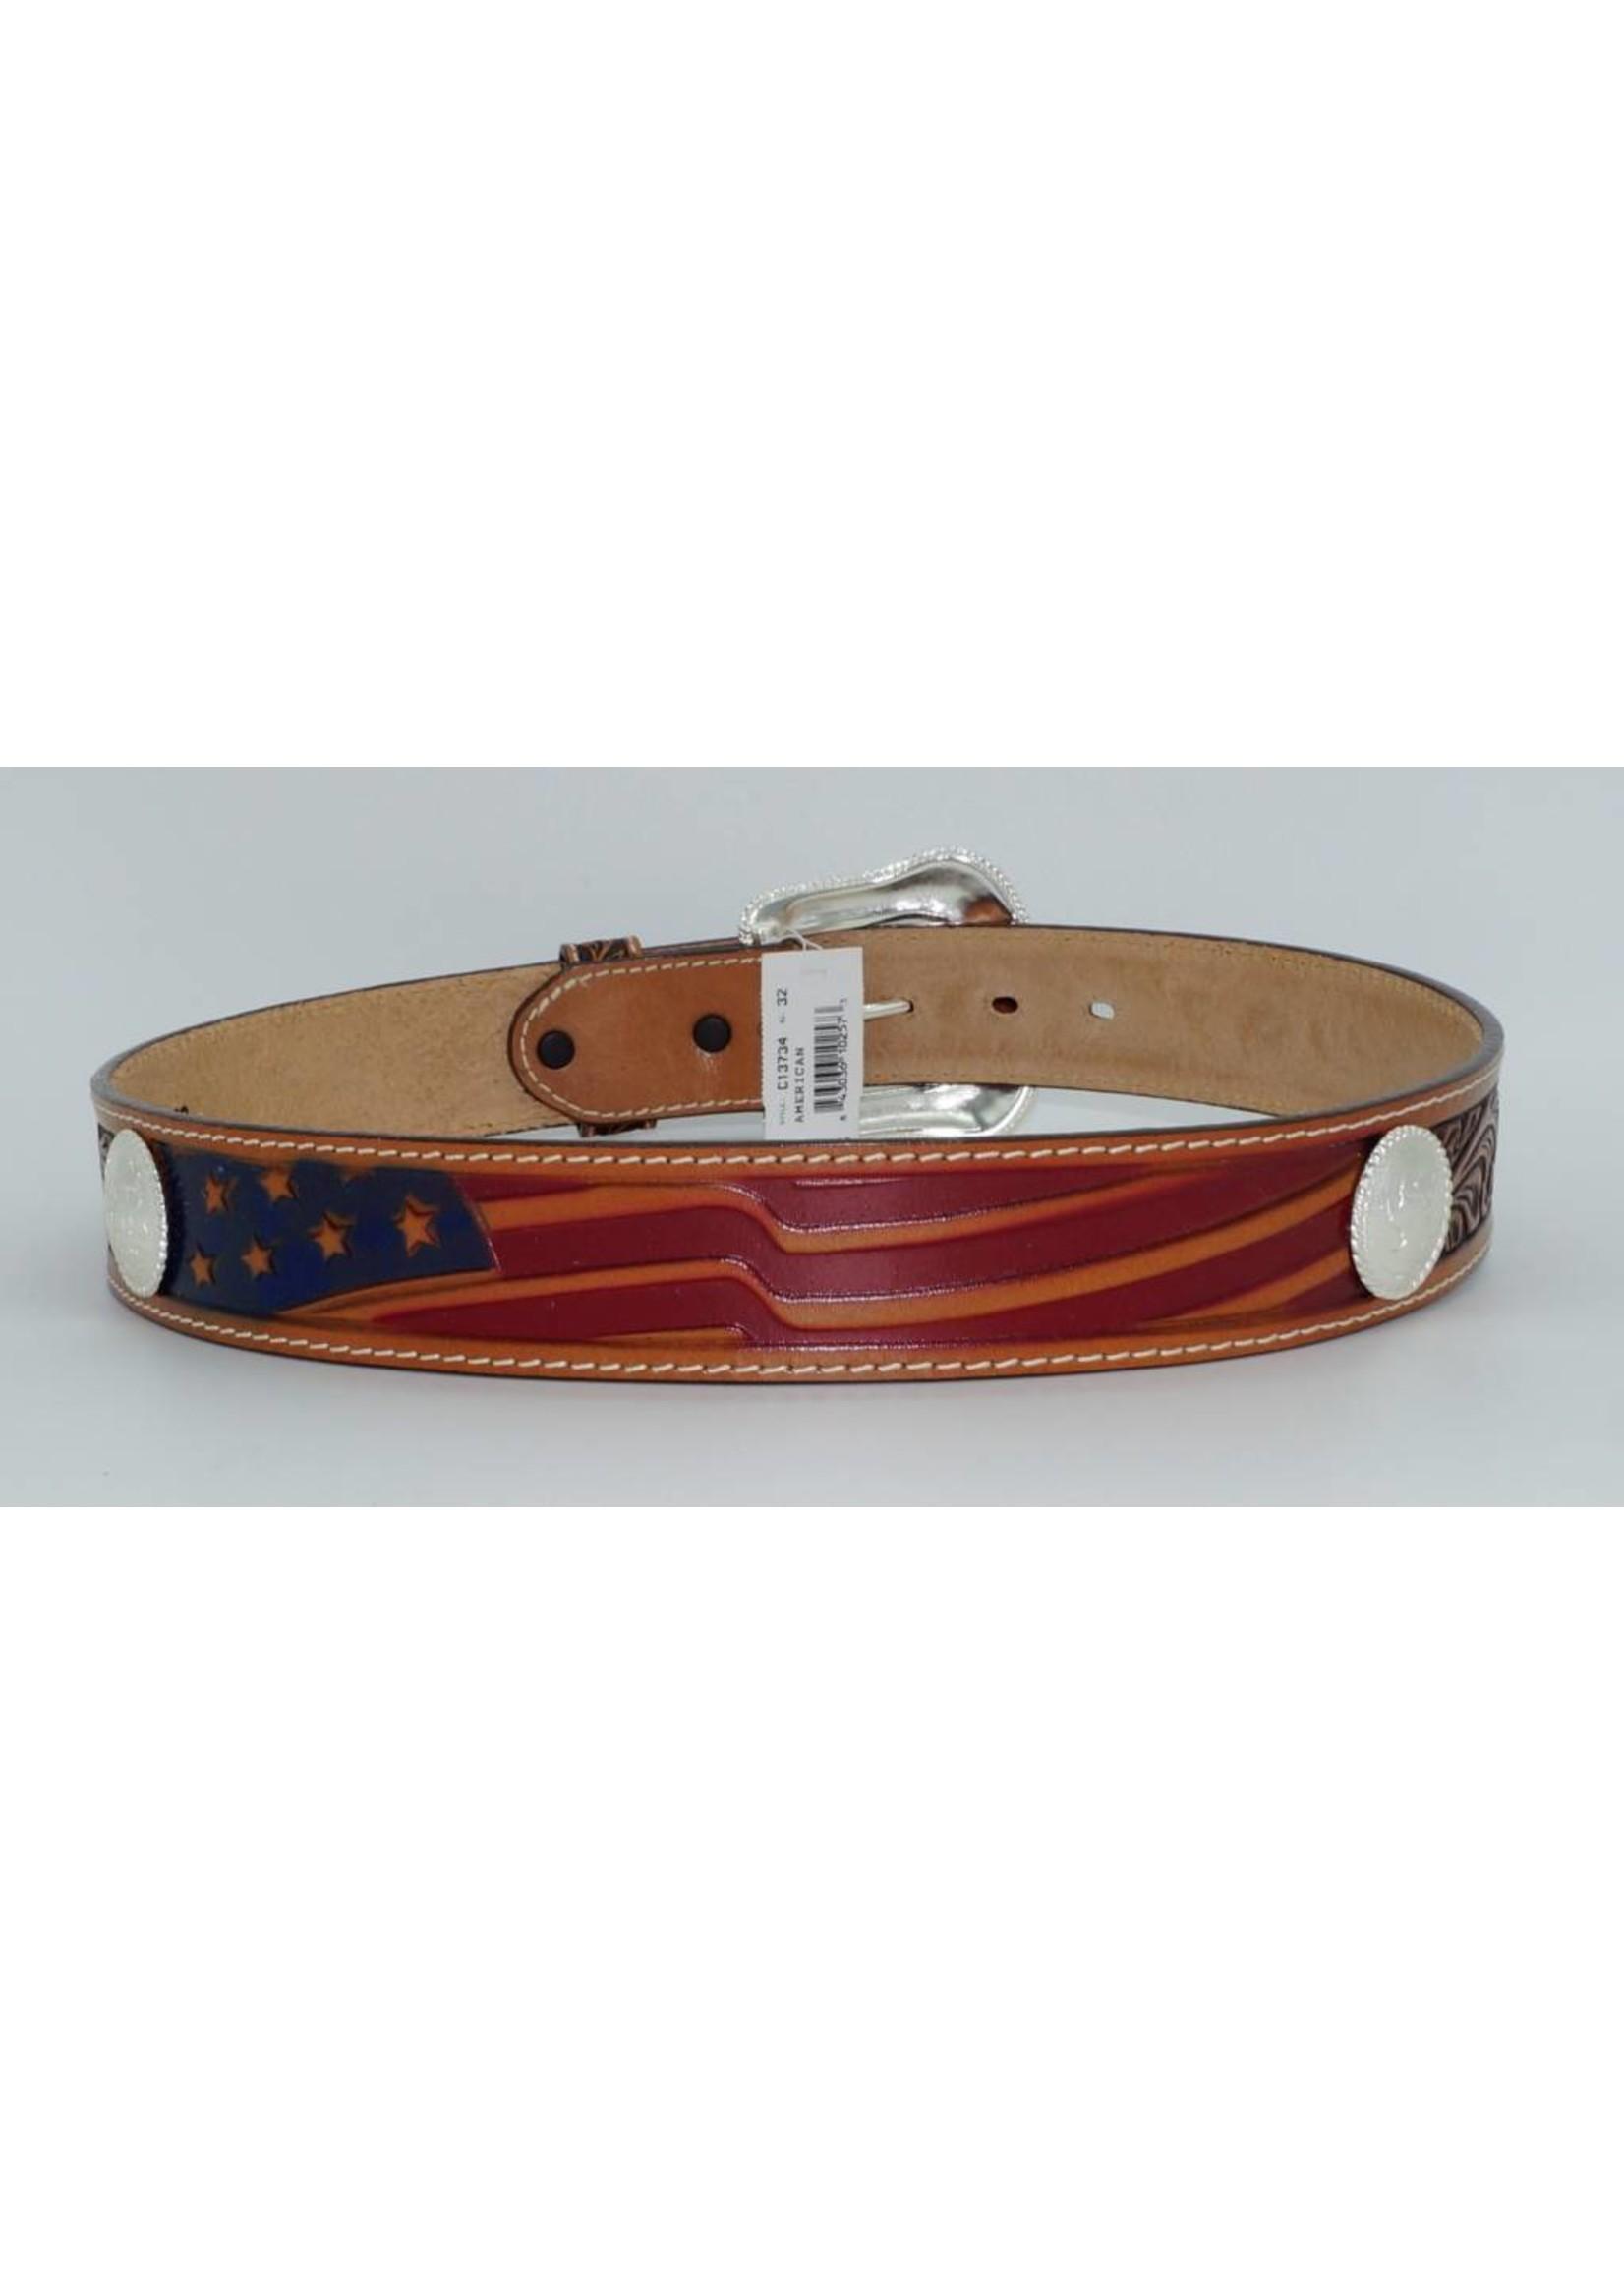 Vintage Torel  Leather Belt Men/'s  size 40100 Top Grain Cowhide